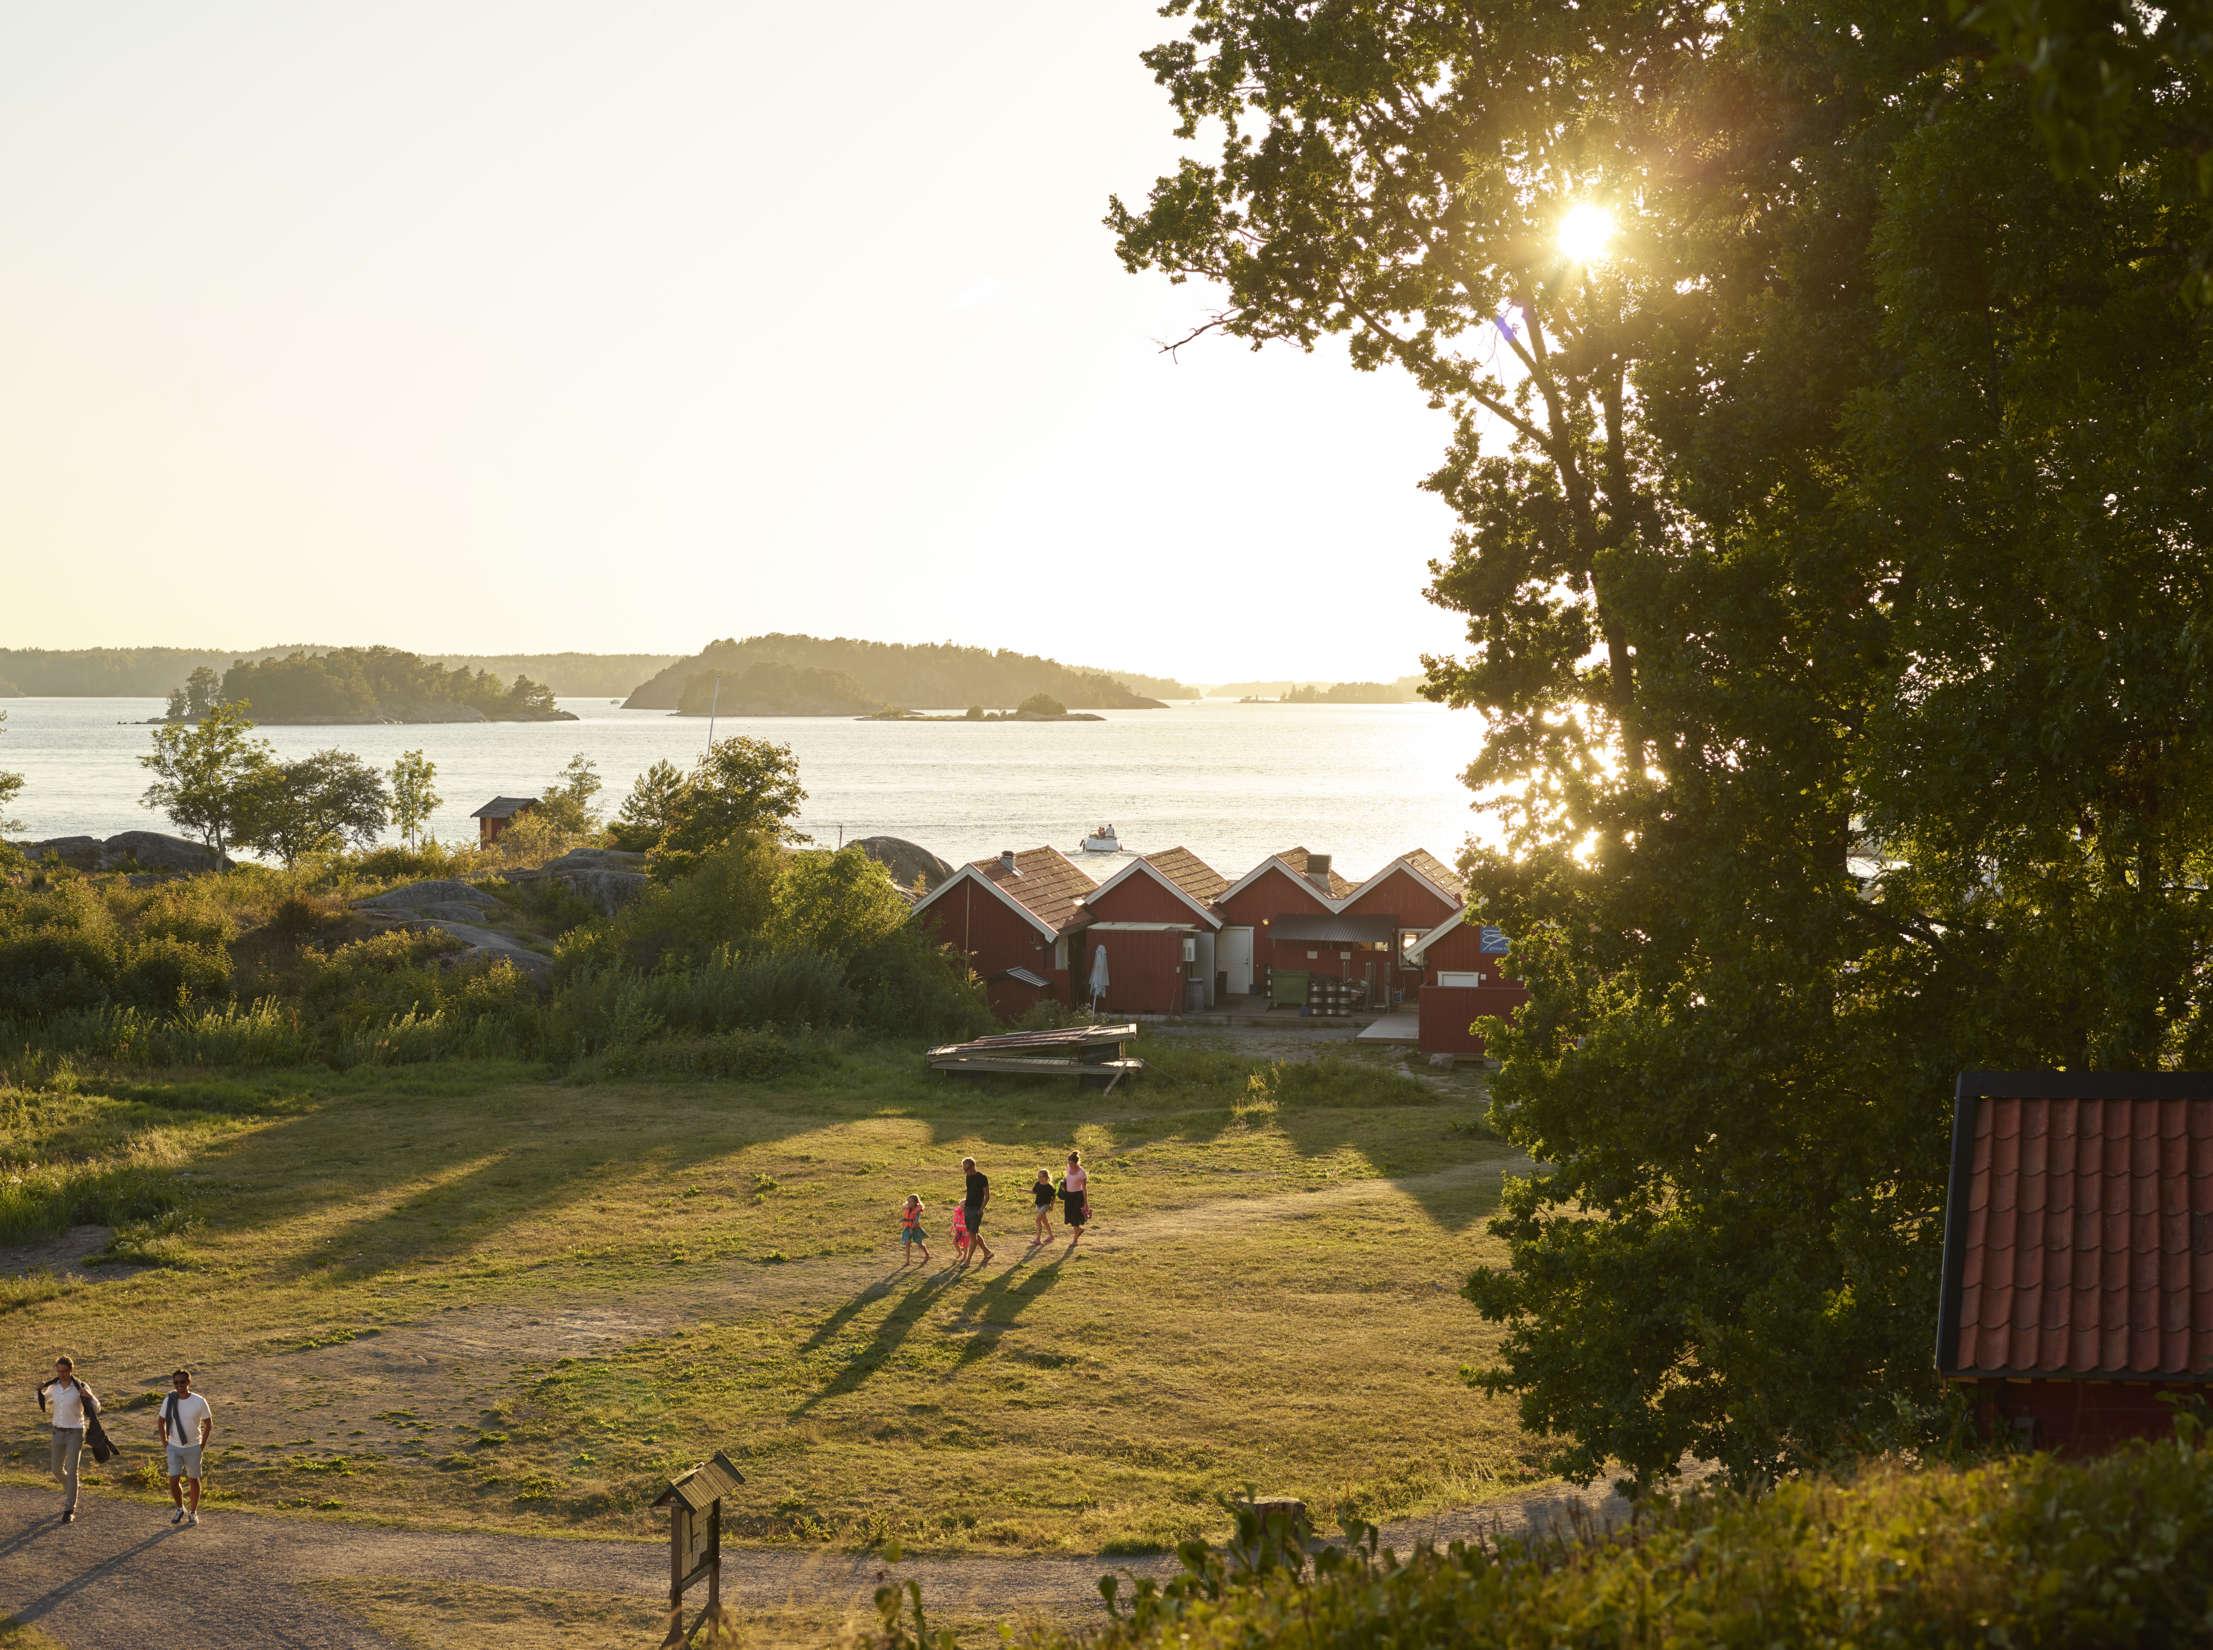 Sunset in the archipelago.